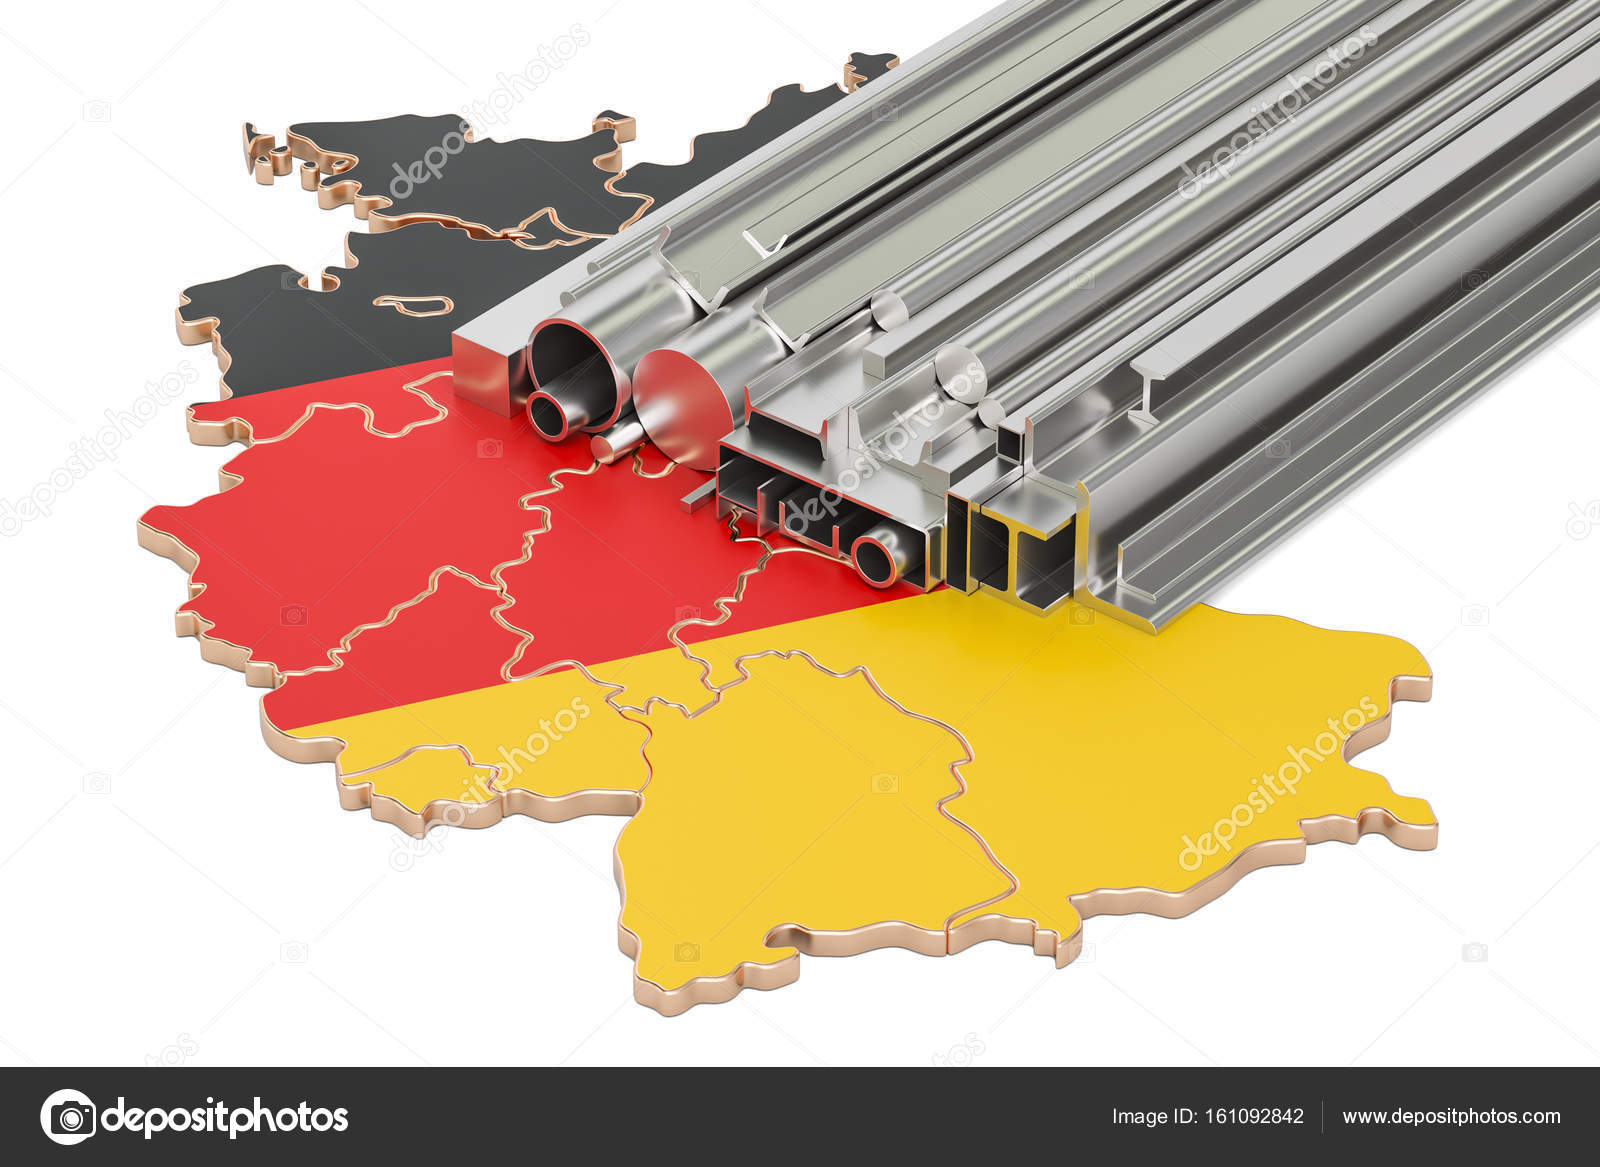 handel tyskland